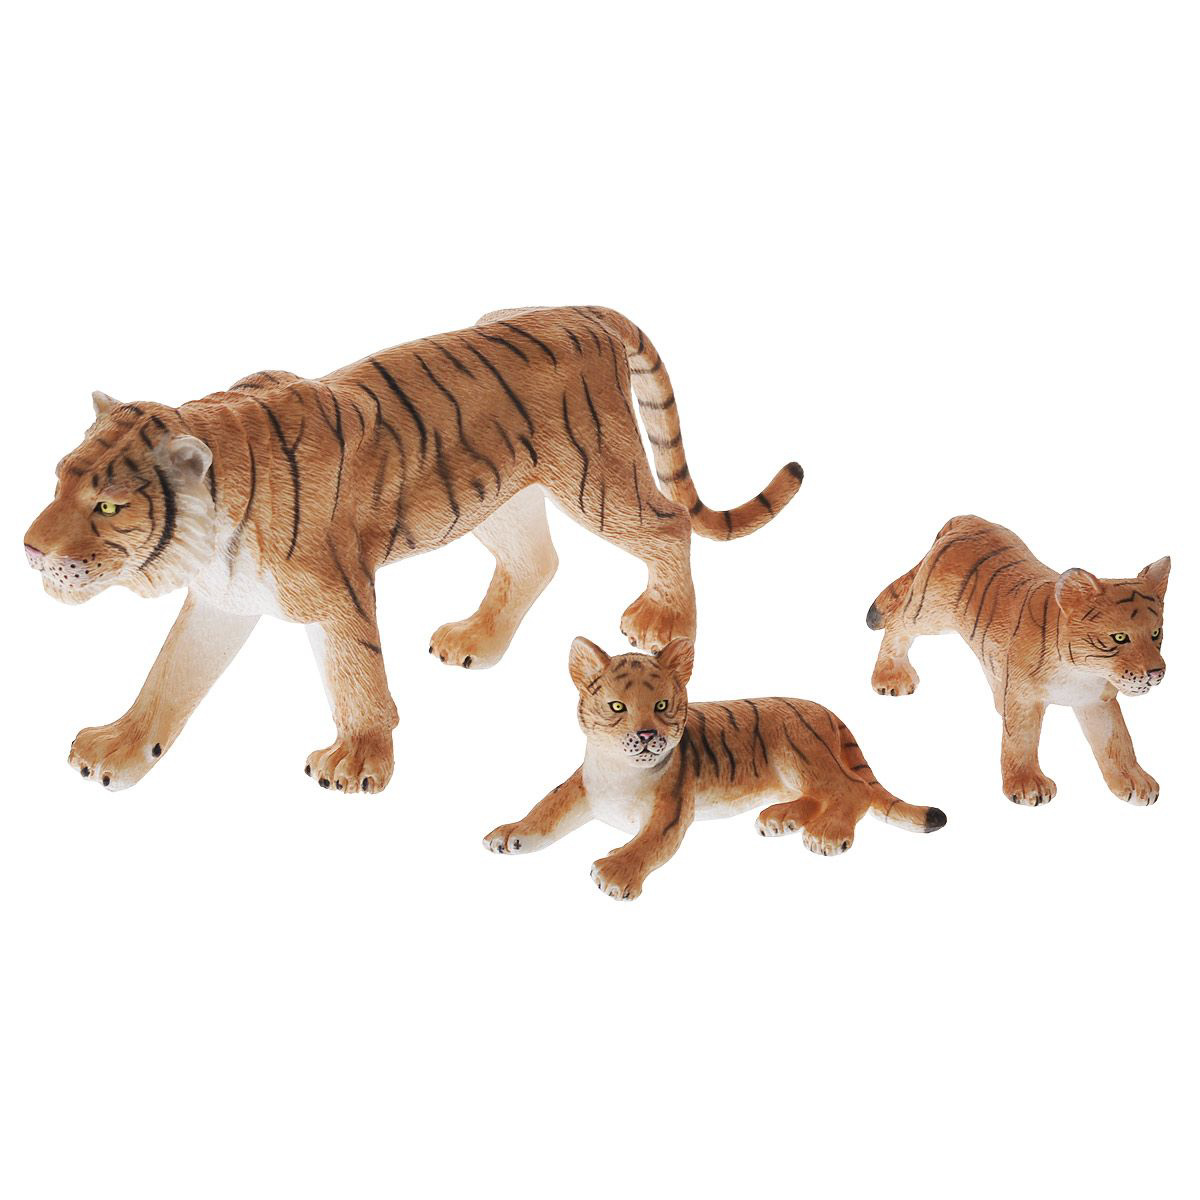 Набор Animal Planet - Тигр с тигрятами, малыйДикая природа (Wildlife)<br>Набор Animal Planet - Тигр с тигрятами, малый<br>